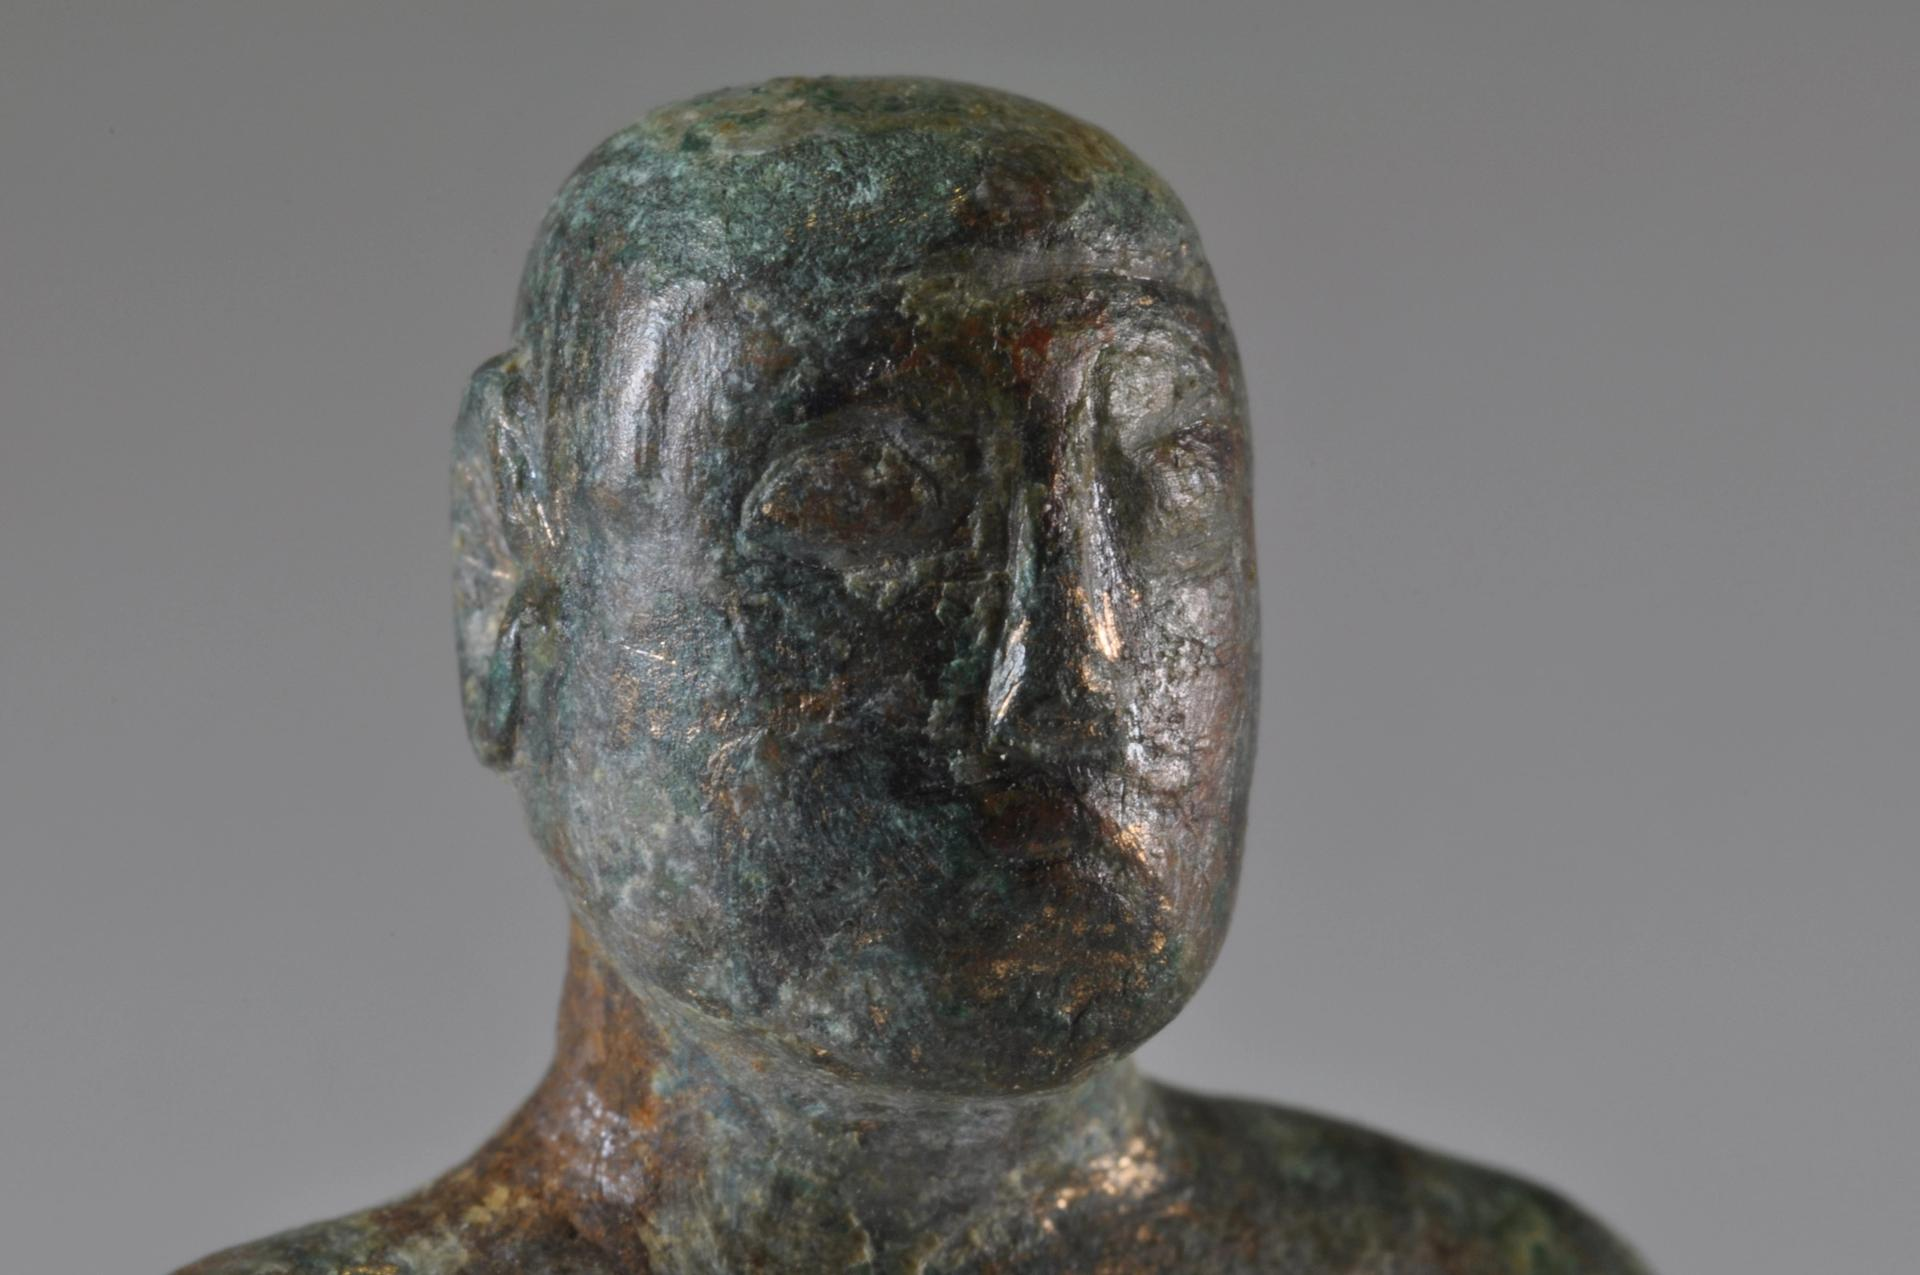 The celtic deity figure found at Wimpole © National Trust, Oxford Archaeology East, James Fairbairn